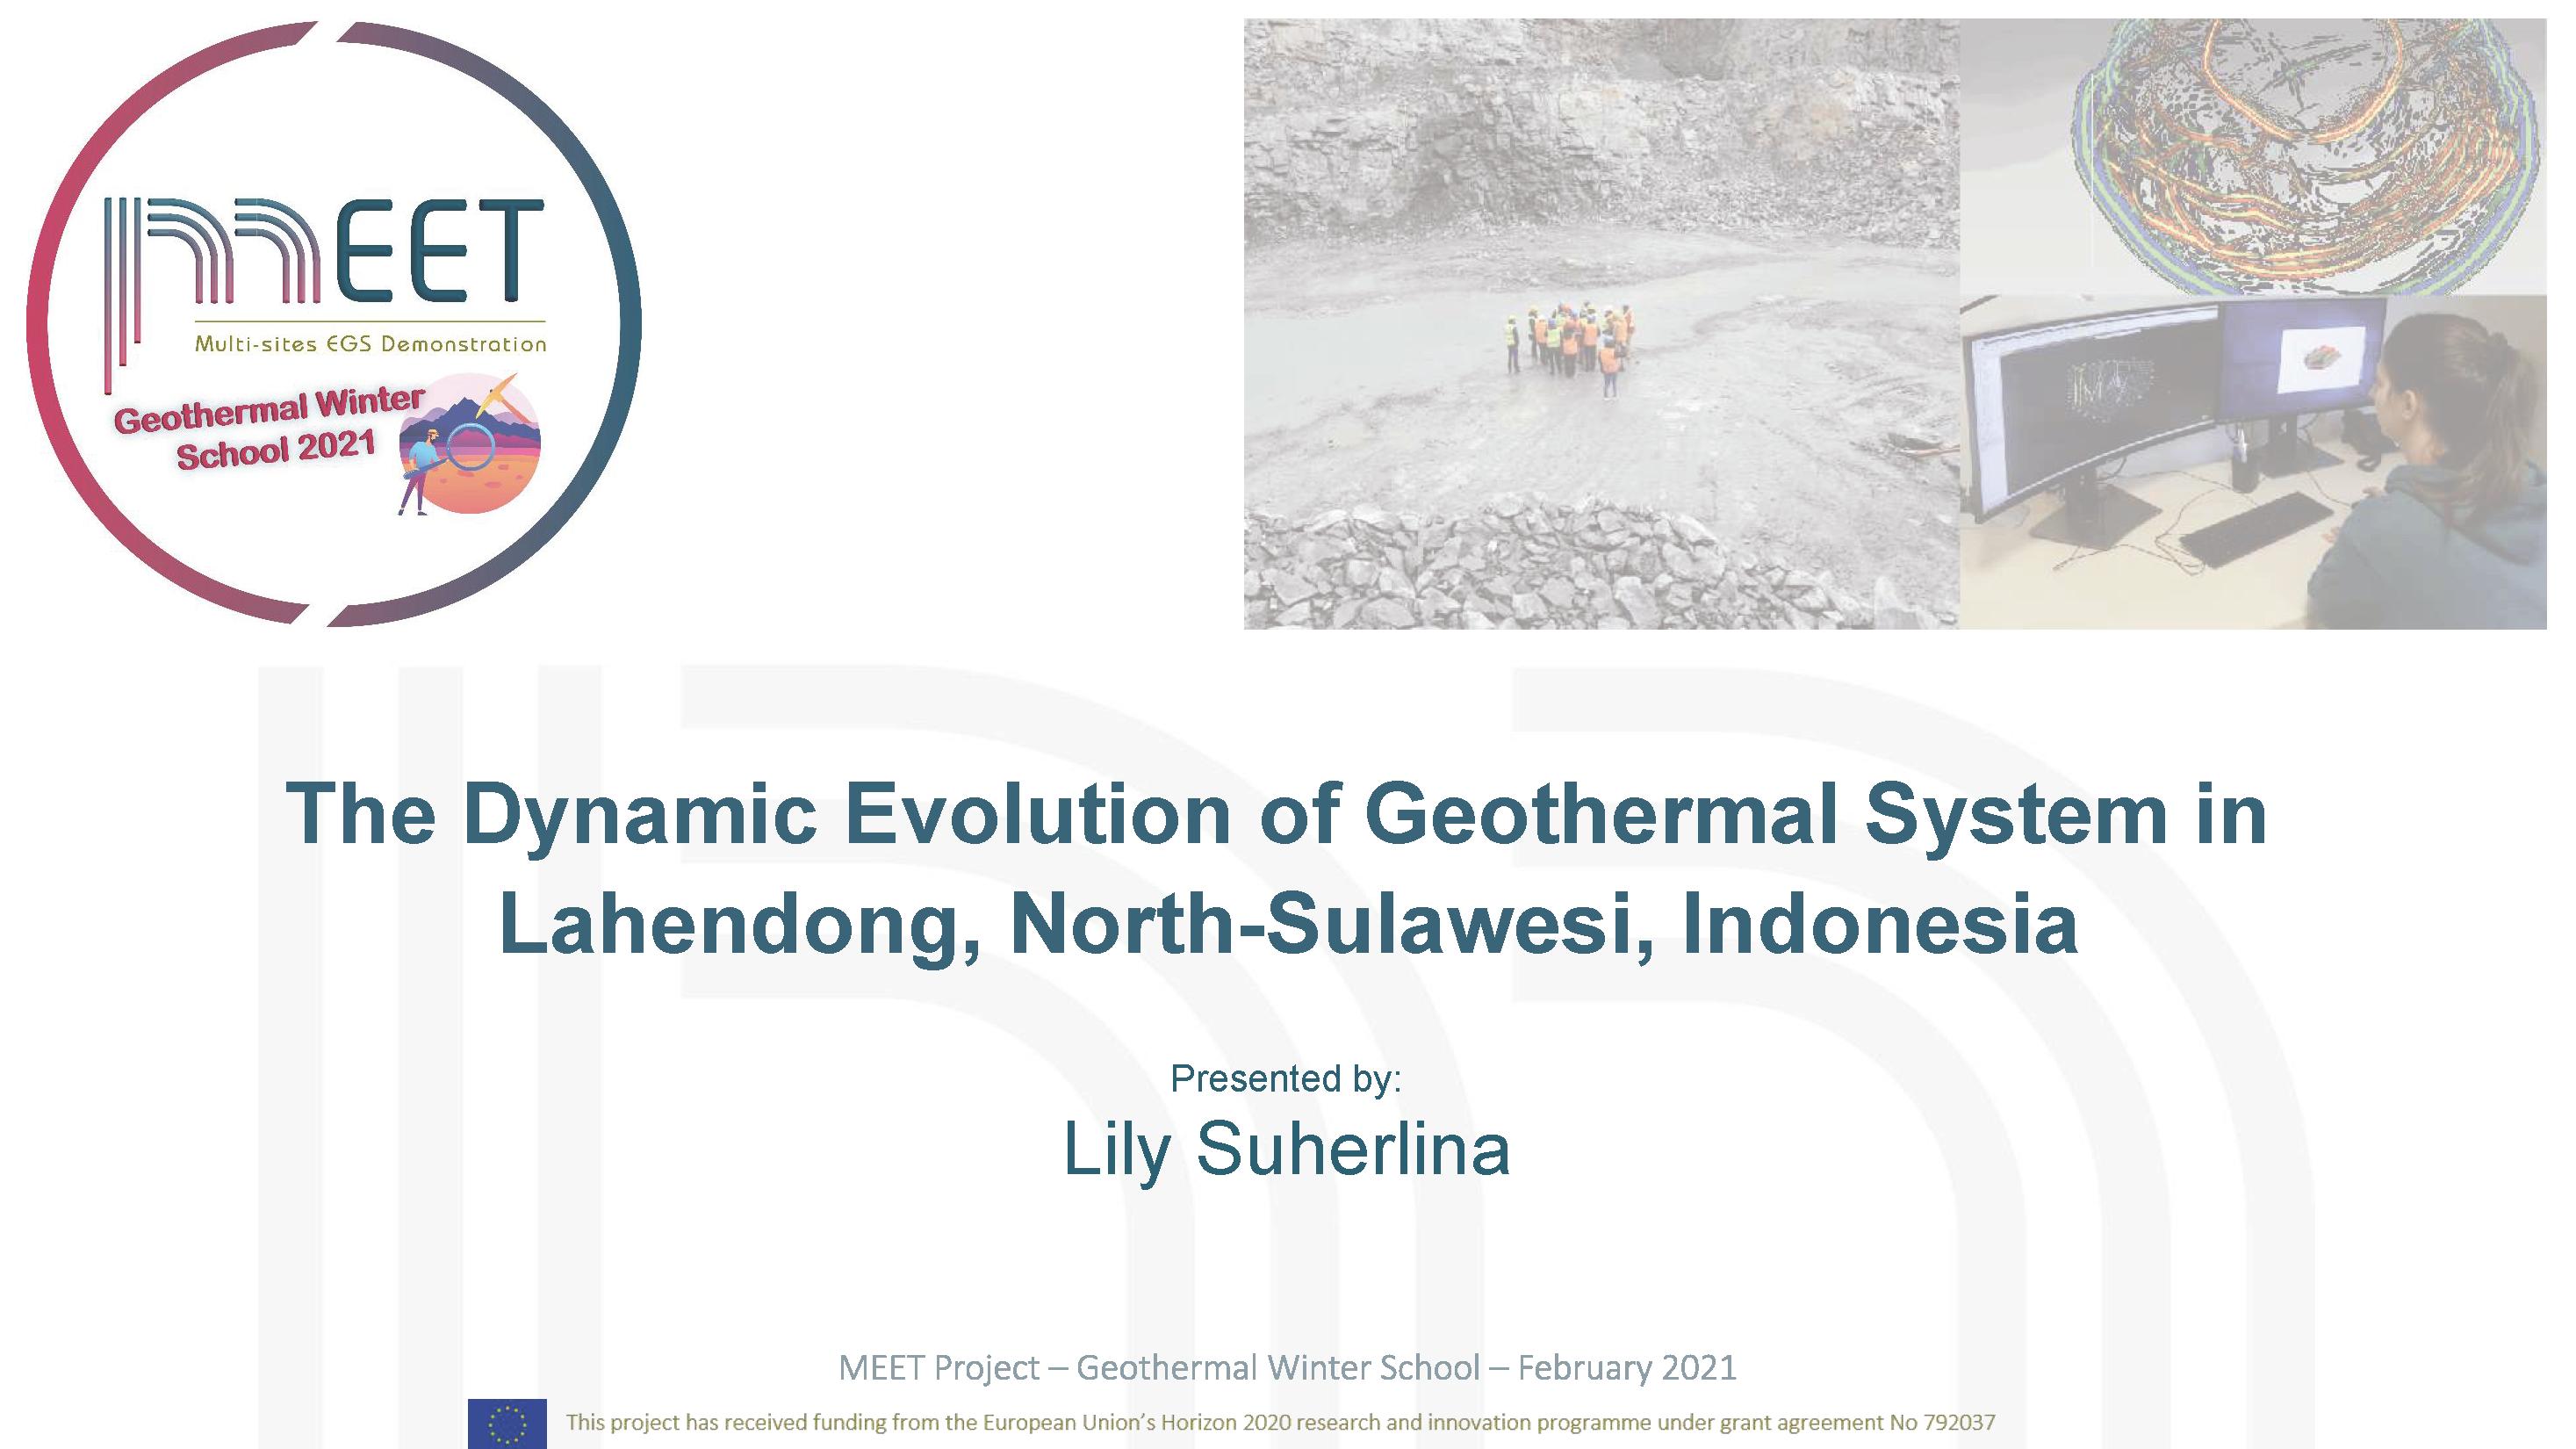 MEET Geothermal Winter School Lily Suherlina first slide visual